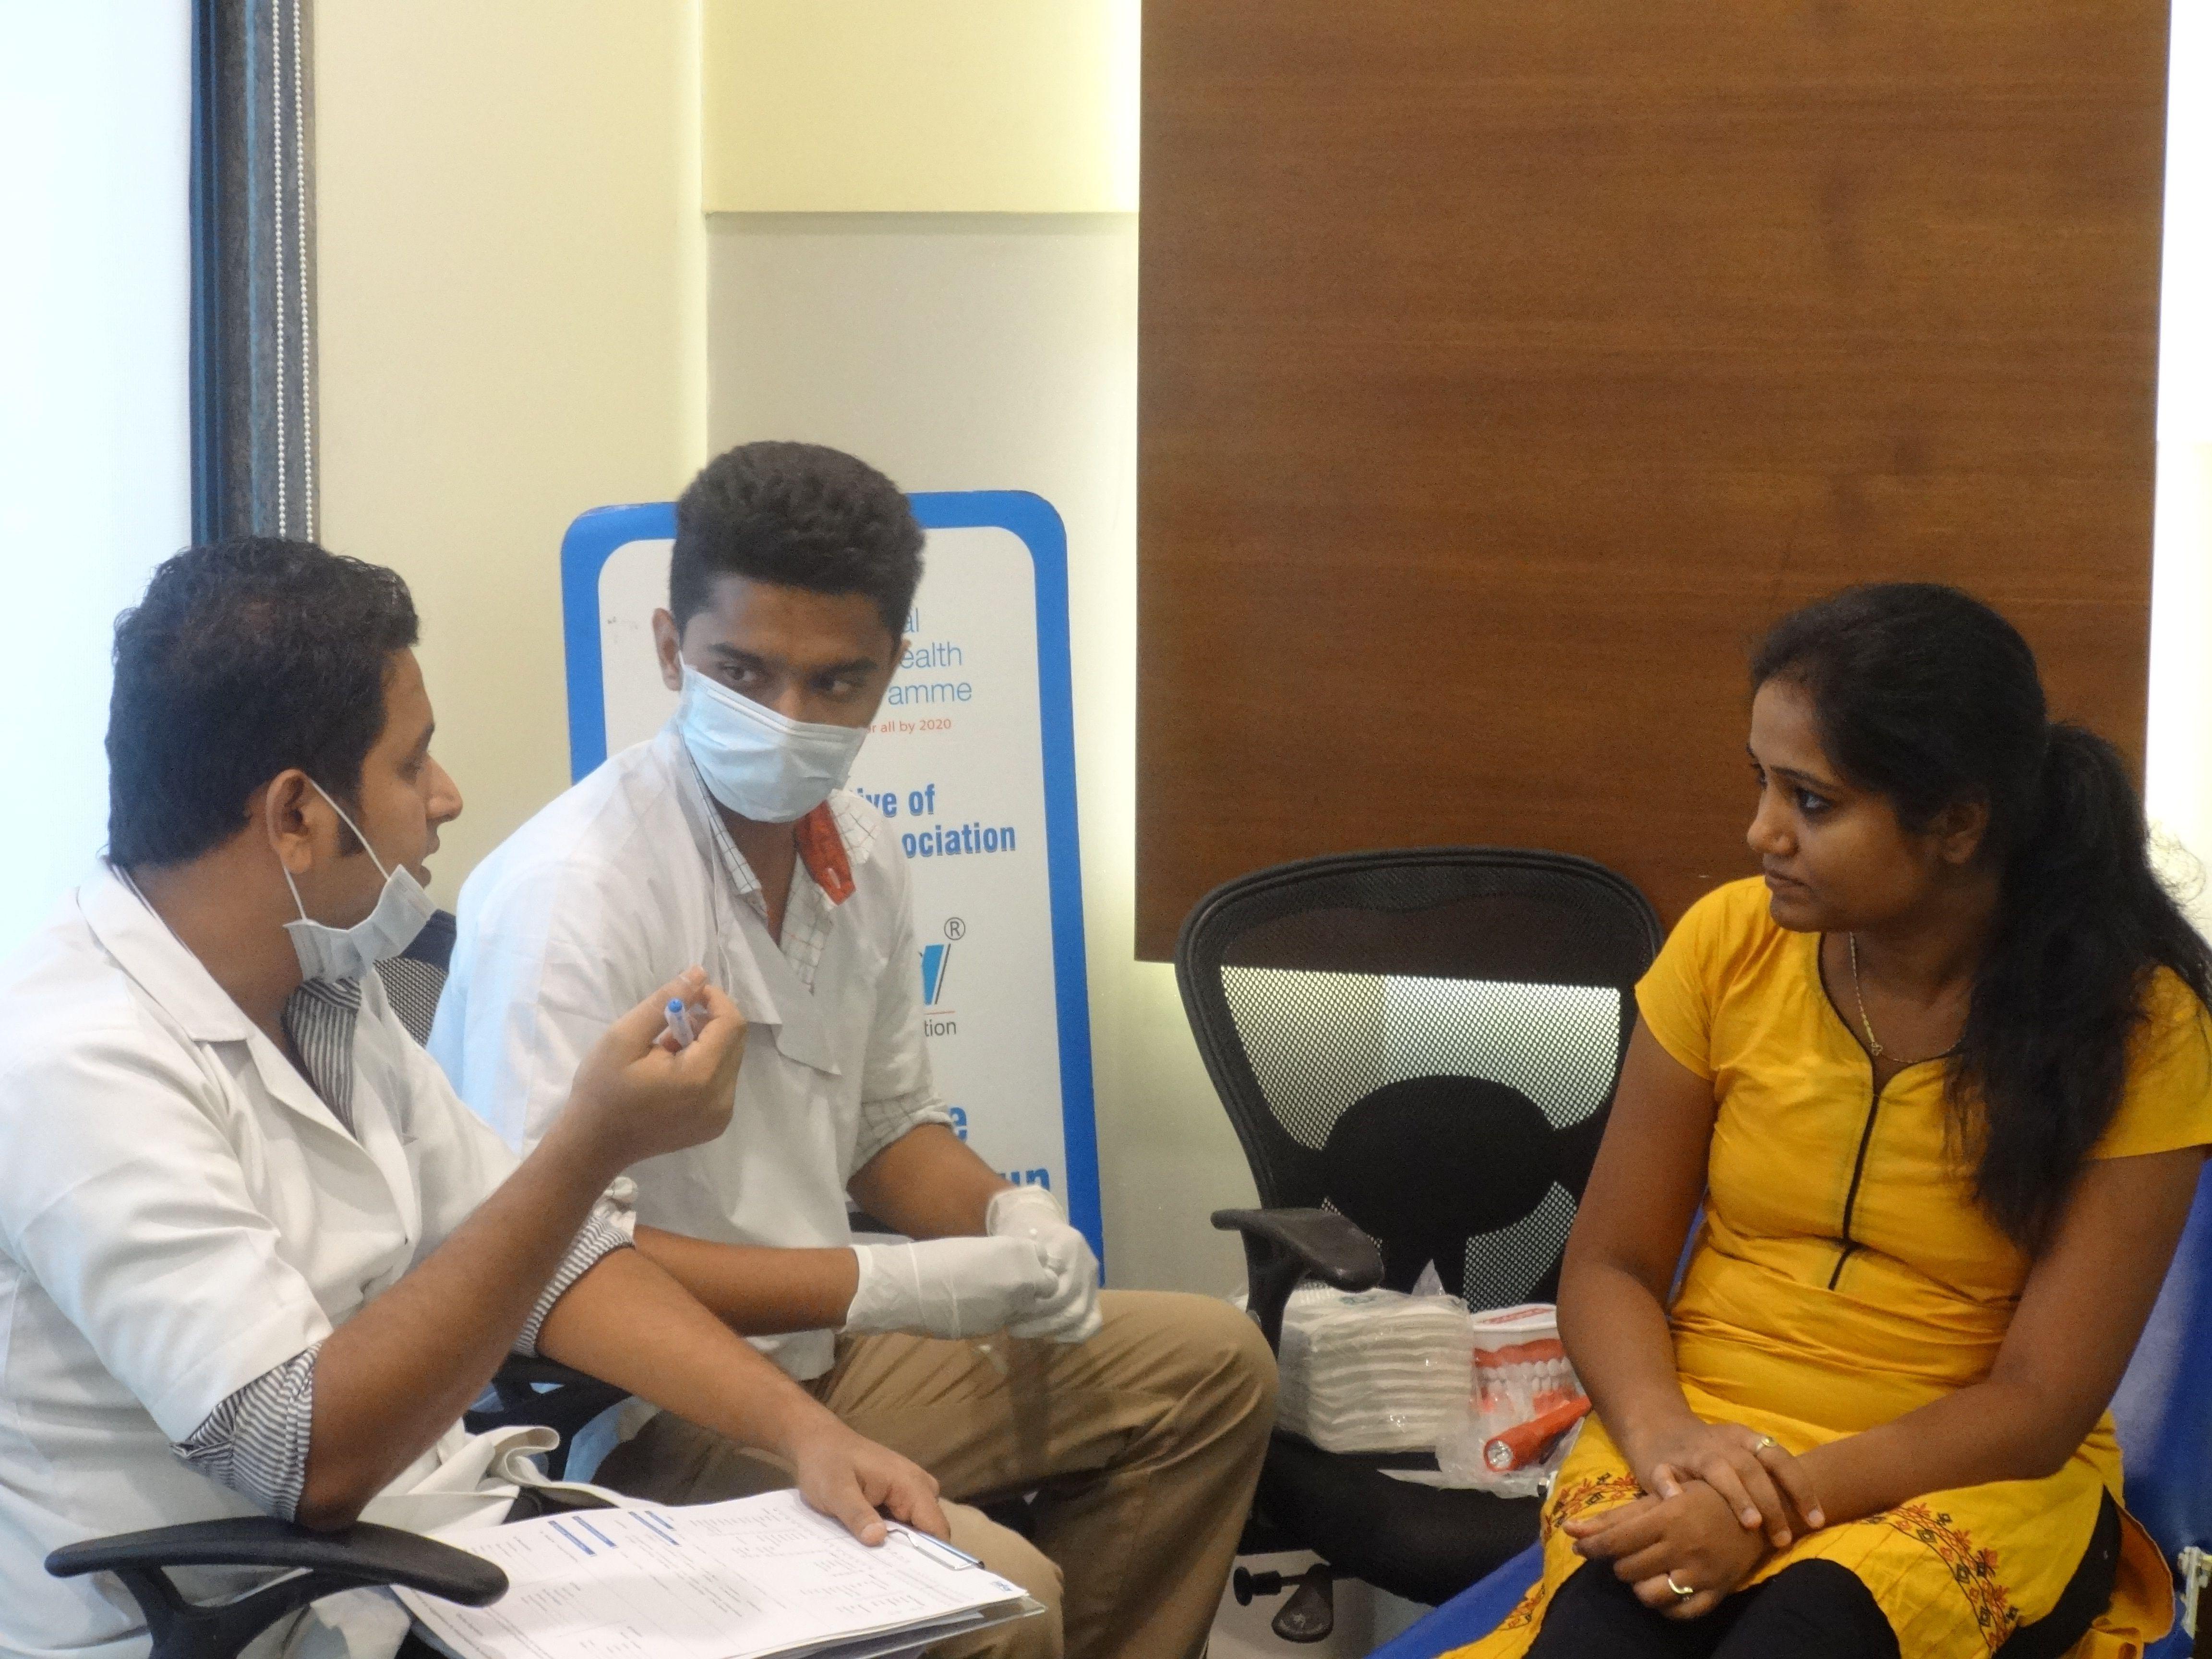 dental # checkup camp at Travel Food Services | NOHP